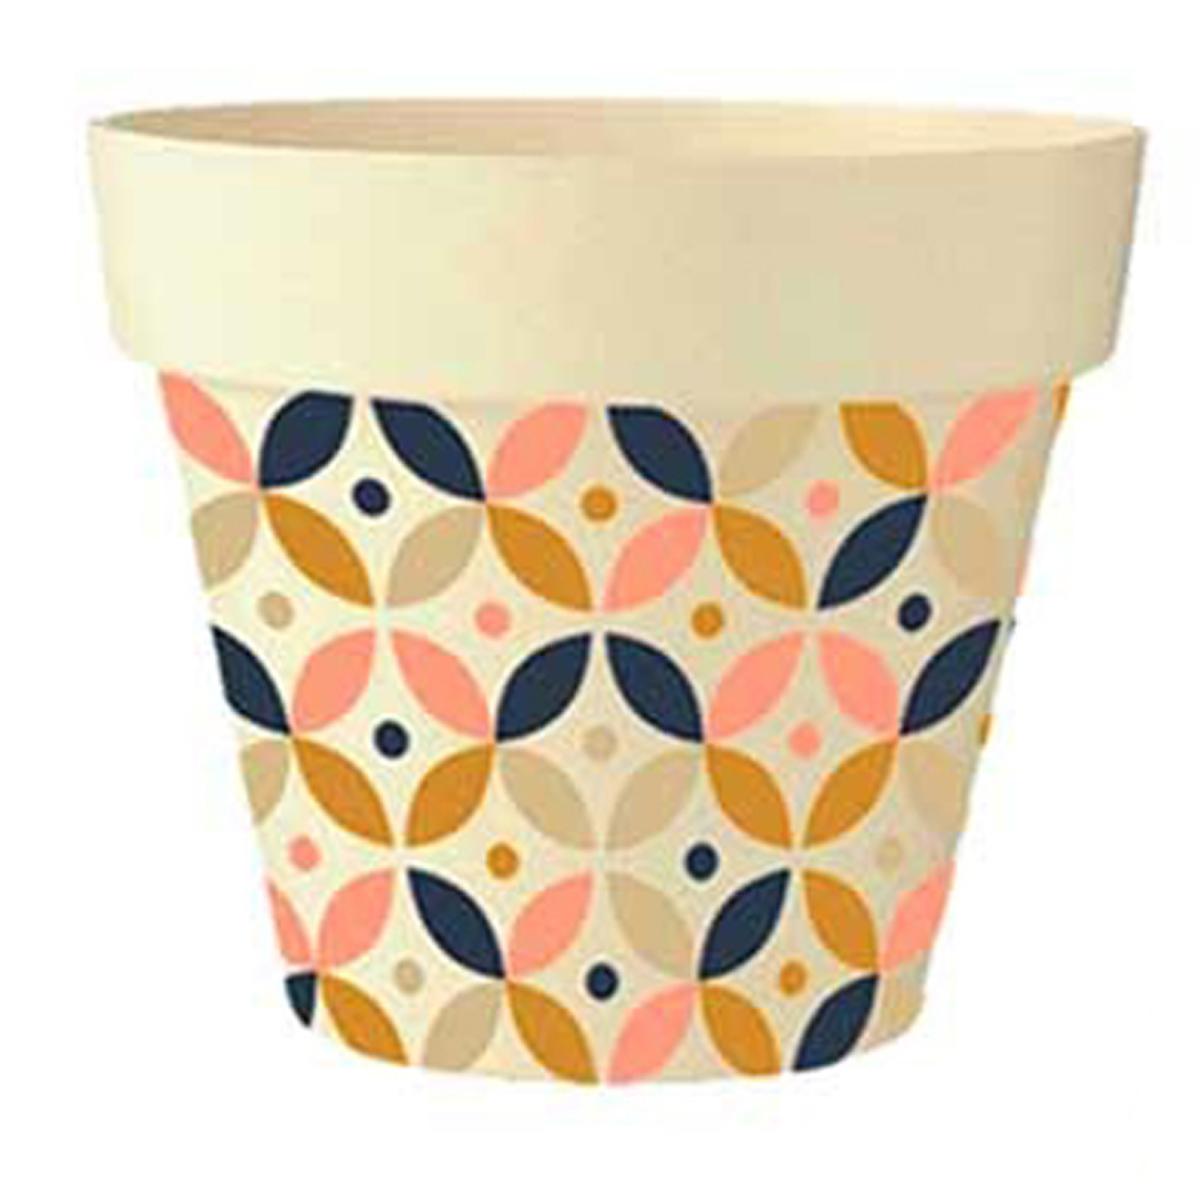 Cache-pot bambou \'Boho\' beige rose marron bleu -  105x95 cm - [Q6422]